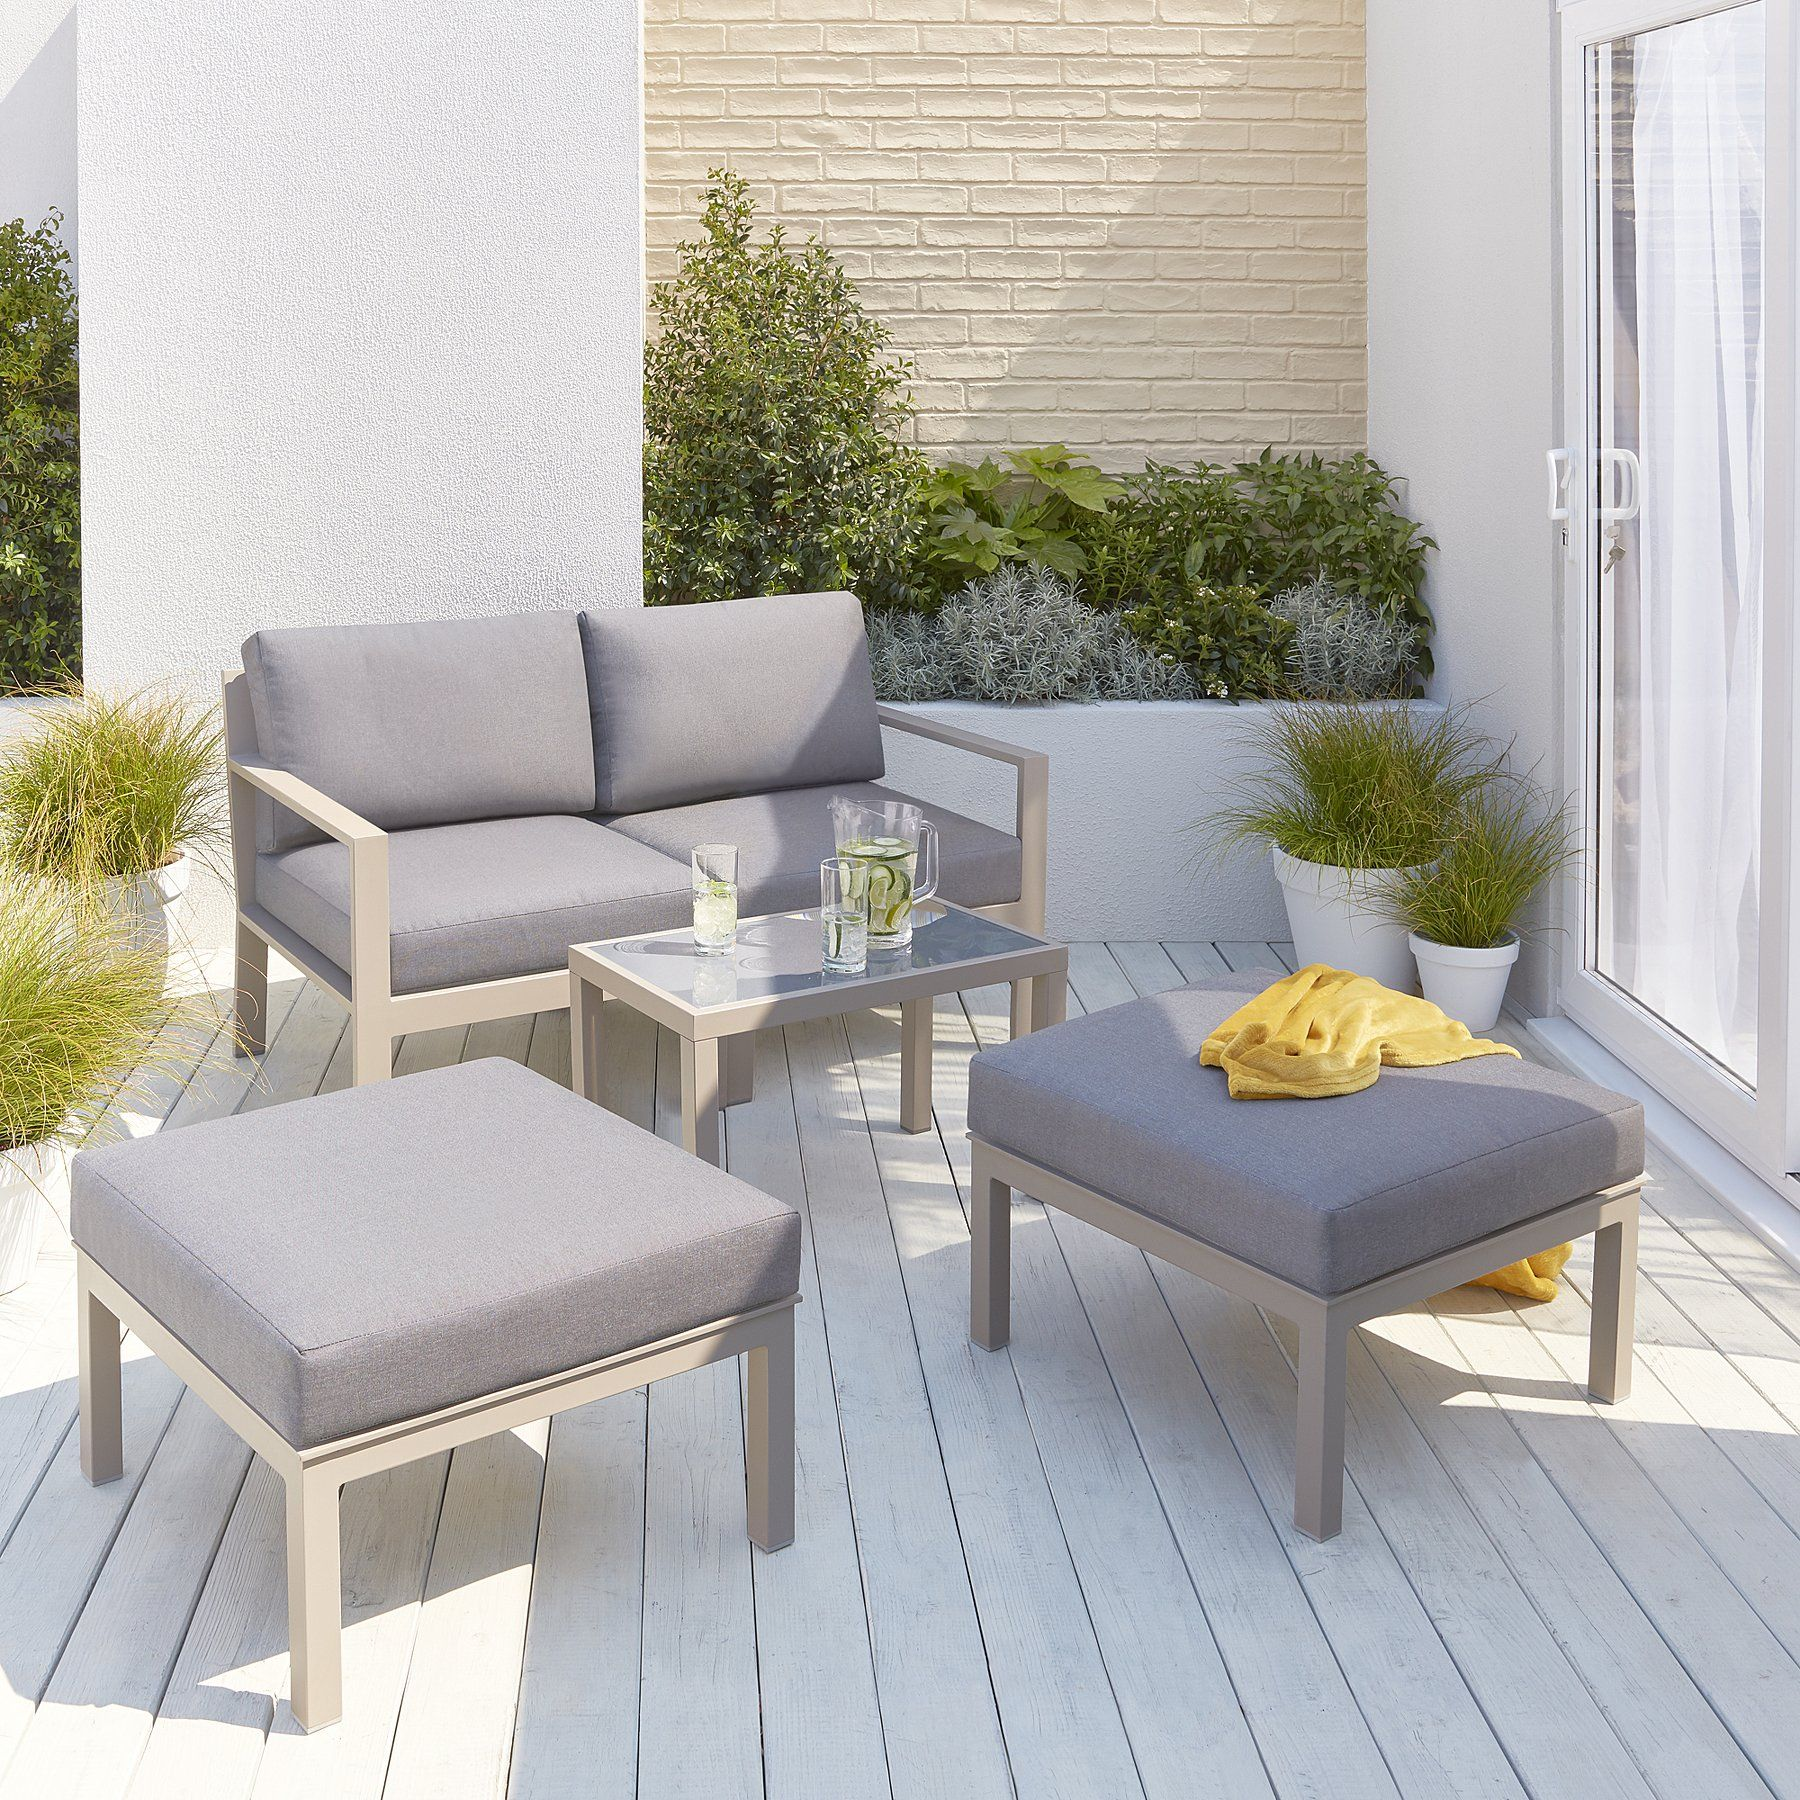 Tucabia 10 Piece Multiway Garden Sofa Set  Outdoor & Garden